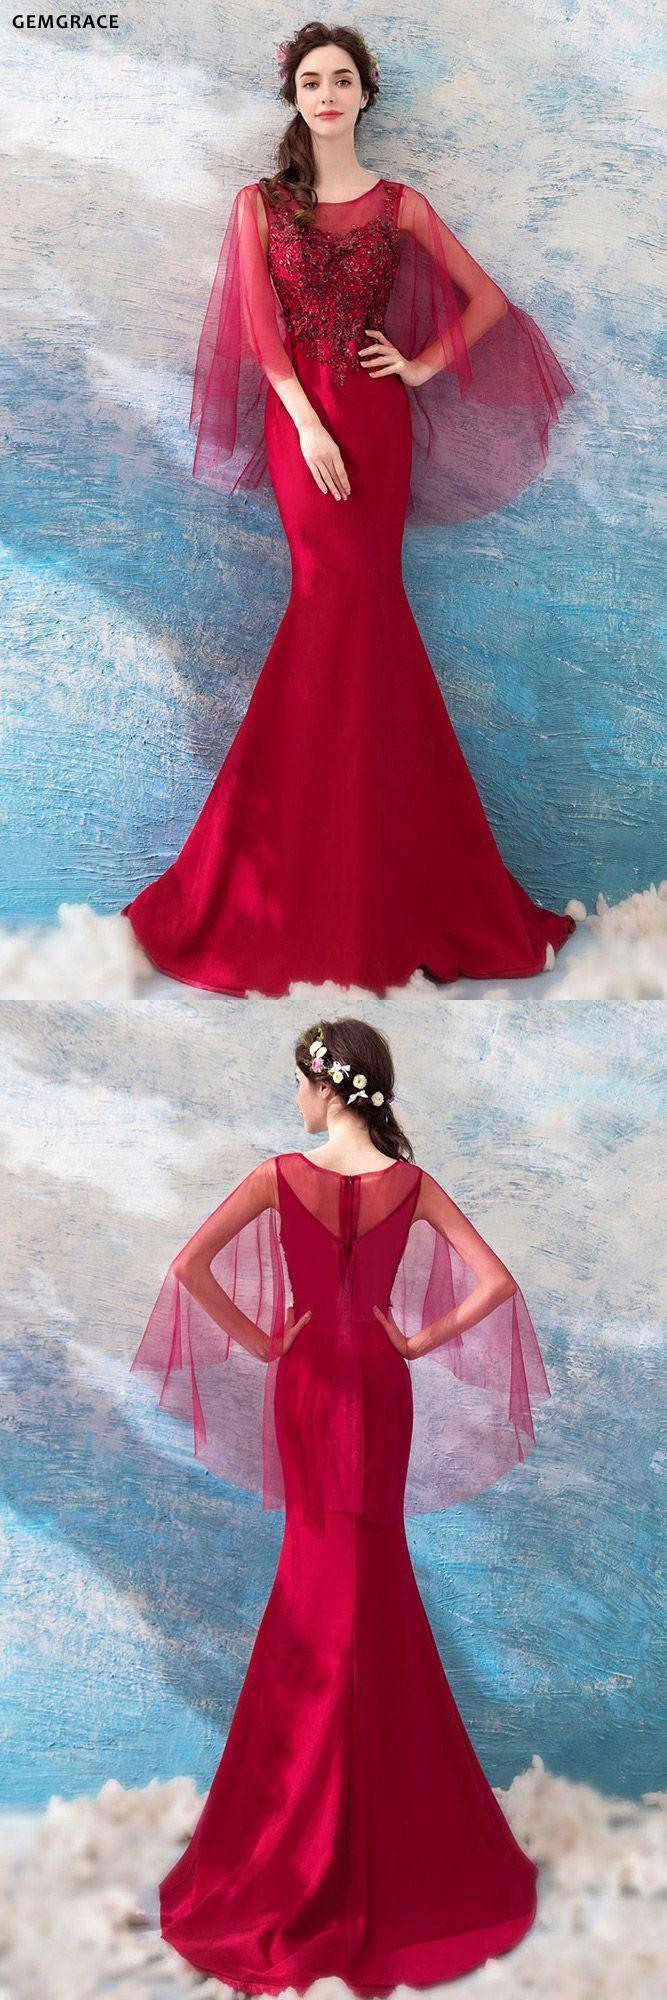 [$120.28] Classy Burgundy Cape Sleeve Mermaid Prom Dress ...